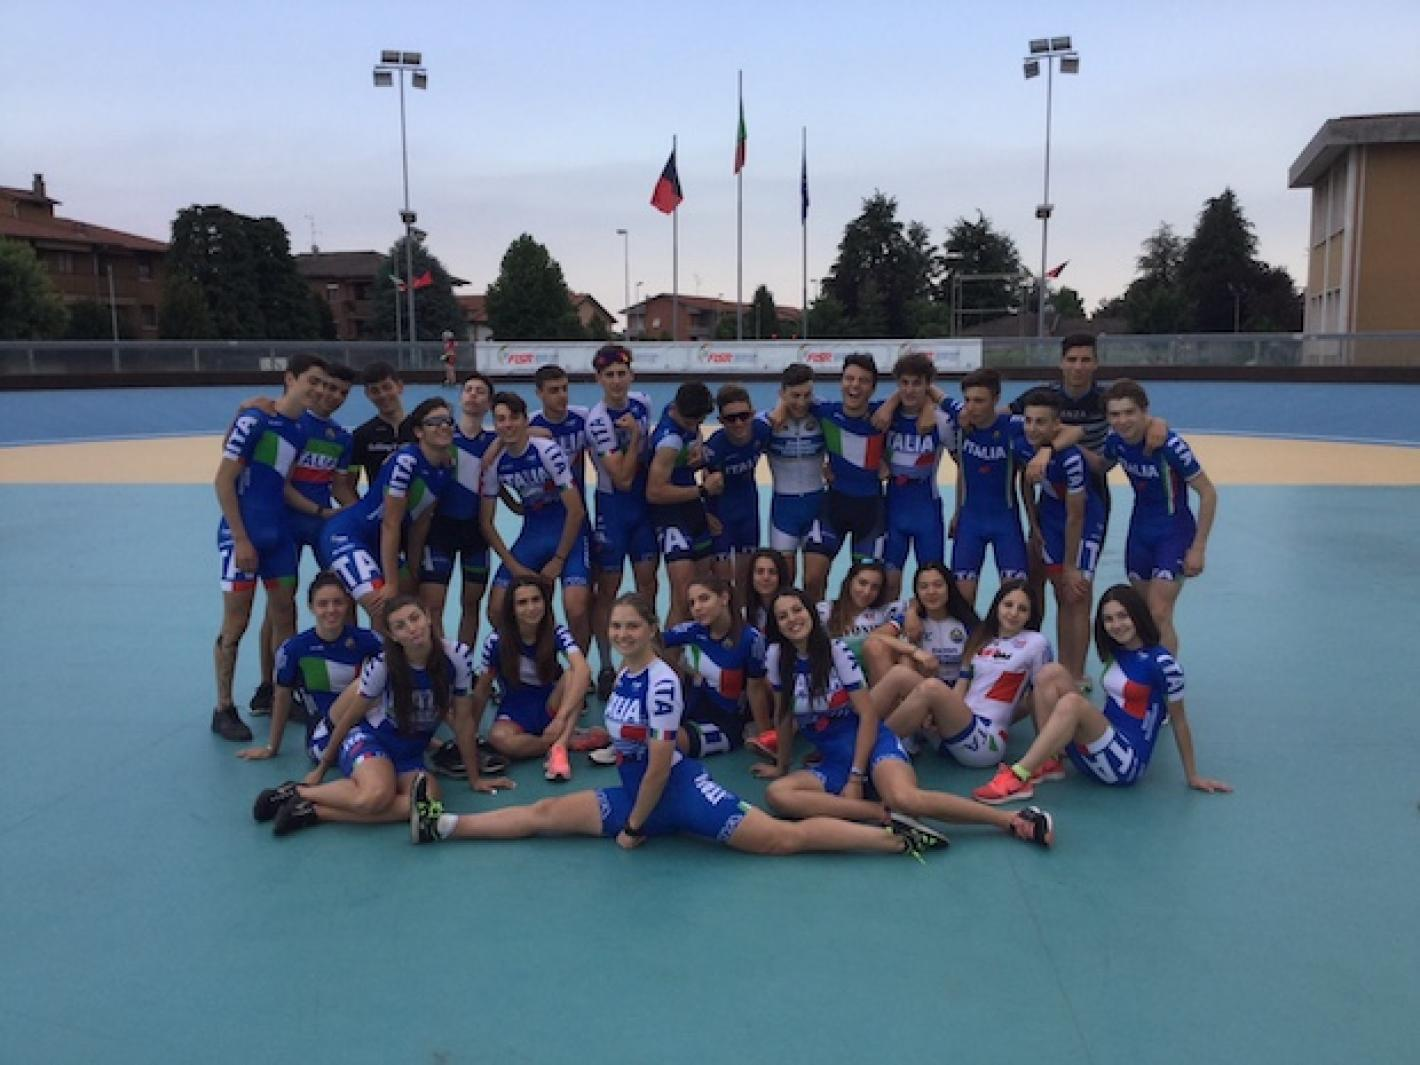 Nazionale-Italiana-inline-speed-skating-ReArtù-2018